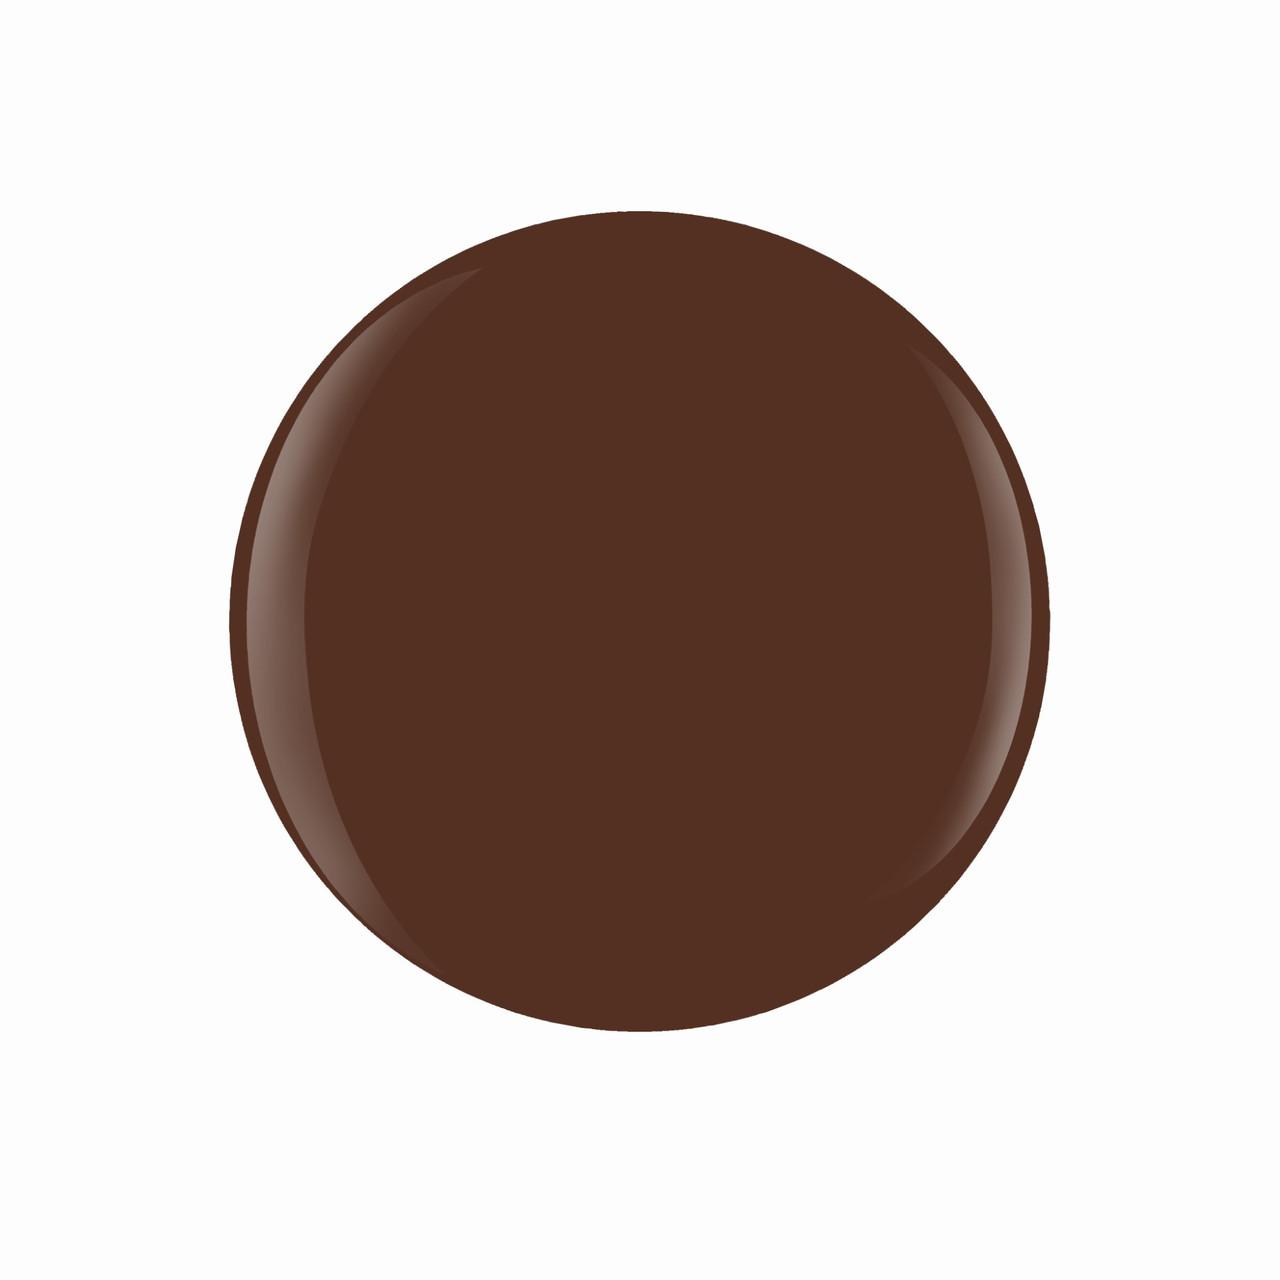 "Gelish Xpress Dip ""Totally Trailblazing"" - Hot Chocolate Crème - 43g   1.5 oz."